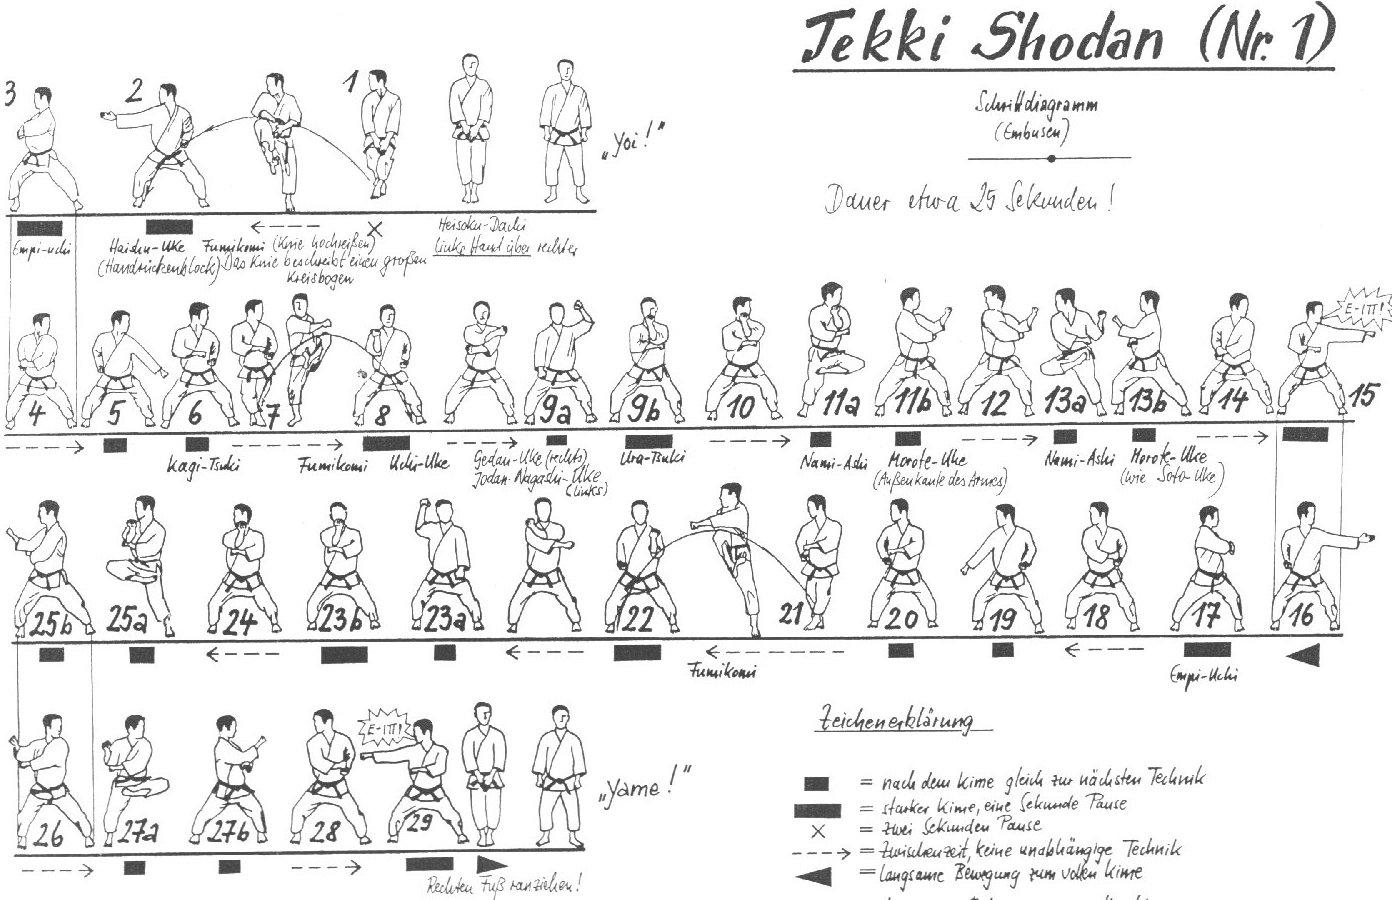 martial arts diagram lithium battery charger circuit karate shotokan view